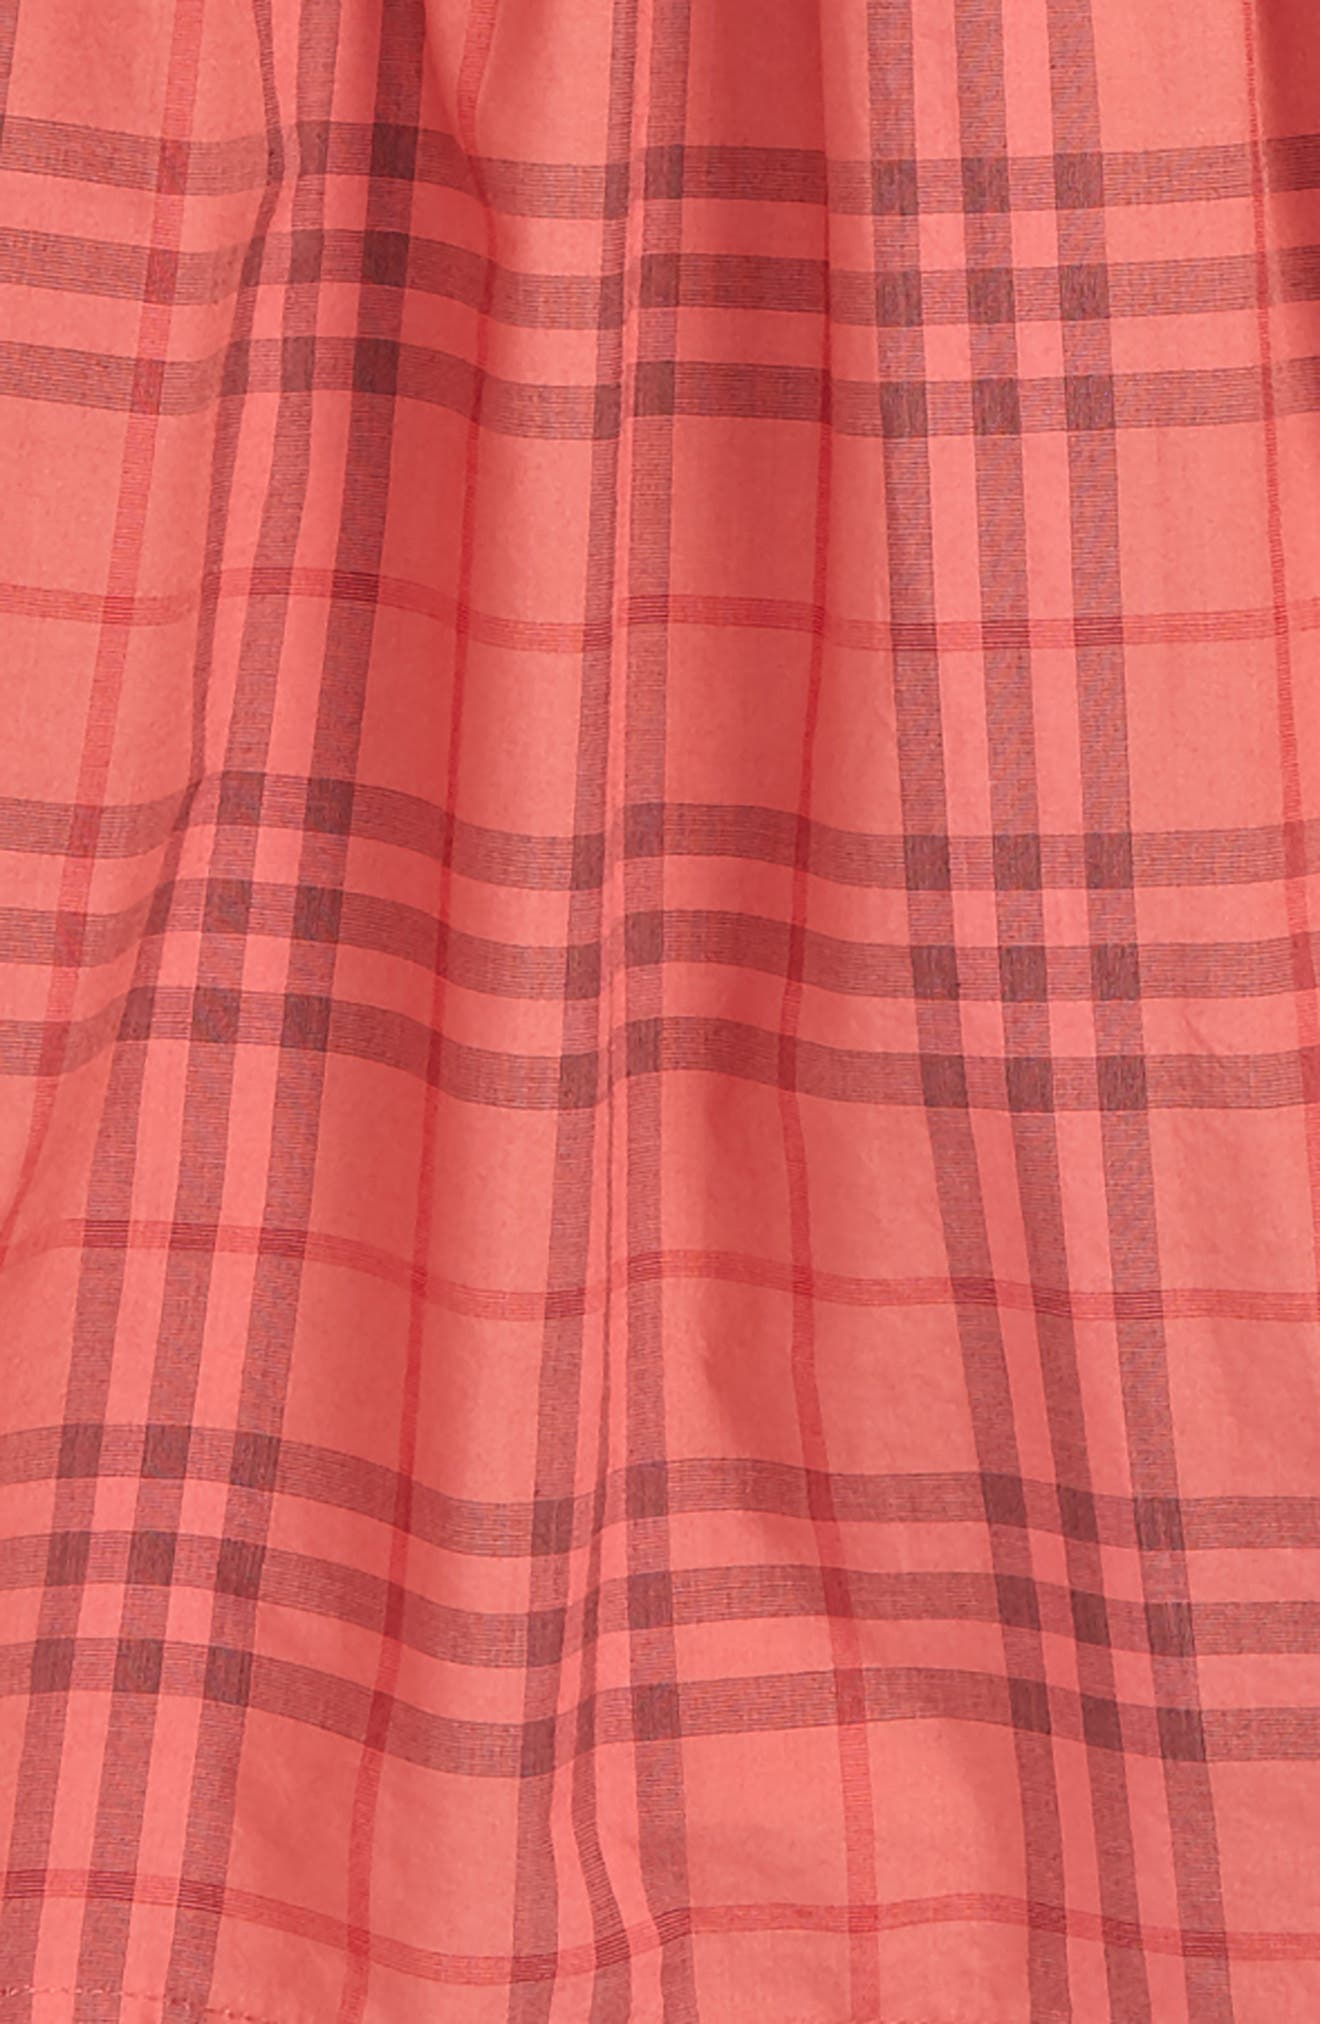 Mini Loralie Ruffle Detail Check Cotton Dress,                             Alternate thumbnail 3, color,                             CORAL RED